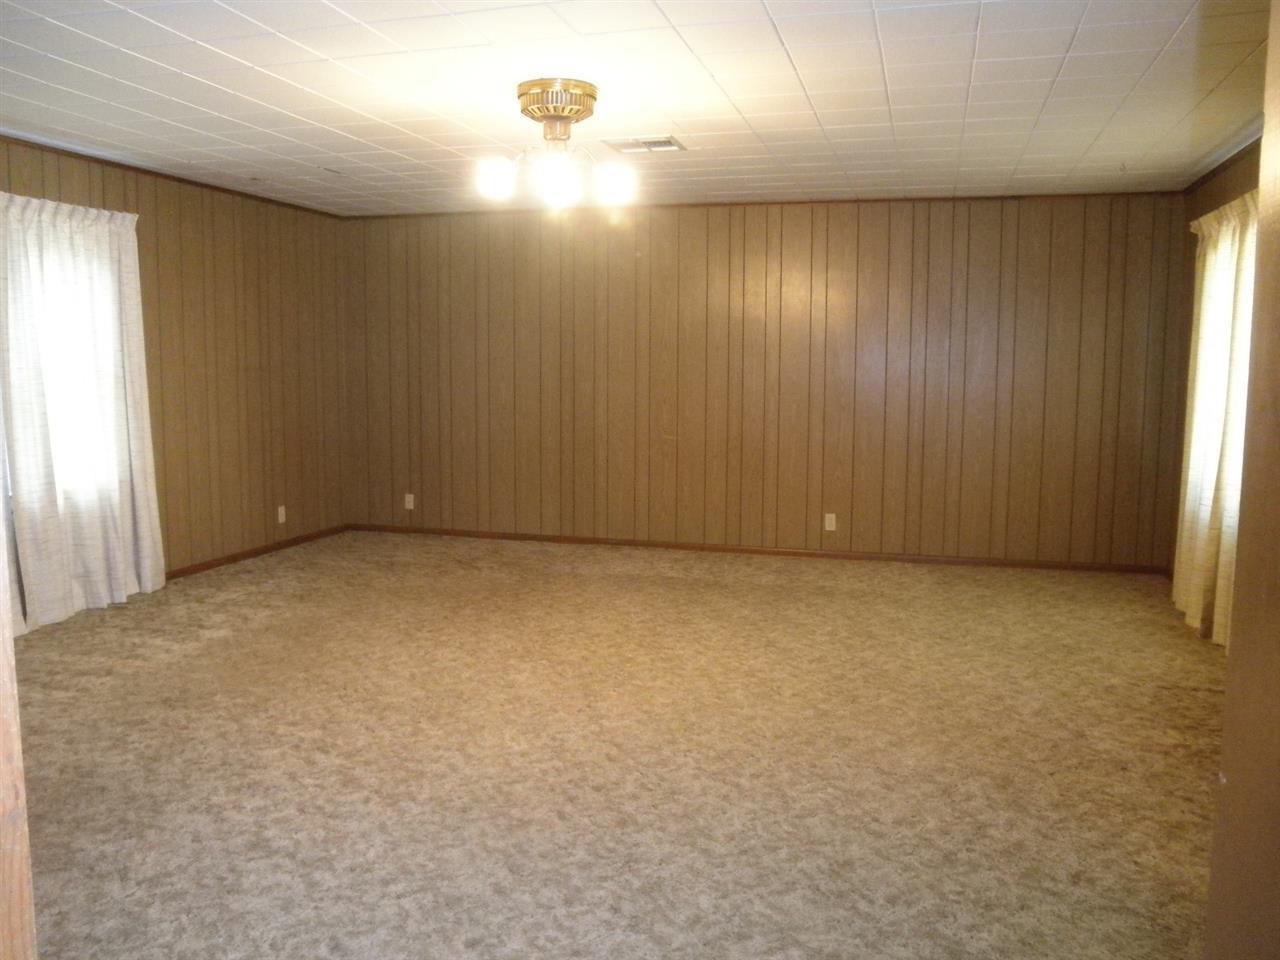 Sold Cross Sale W/ MLS | 916 E Cherry Ponca City, OK 74601 3